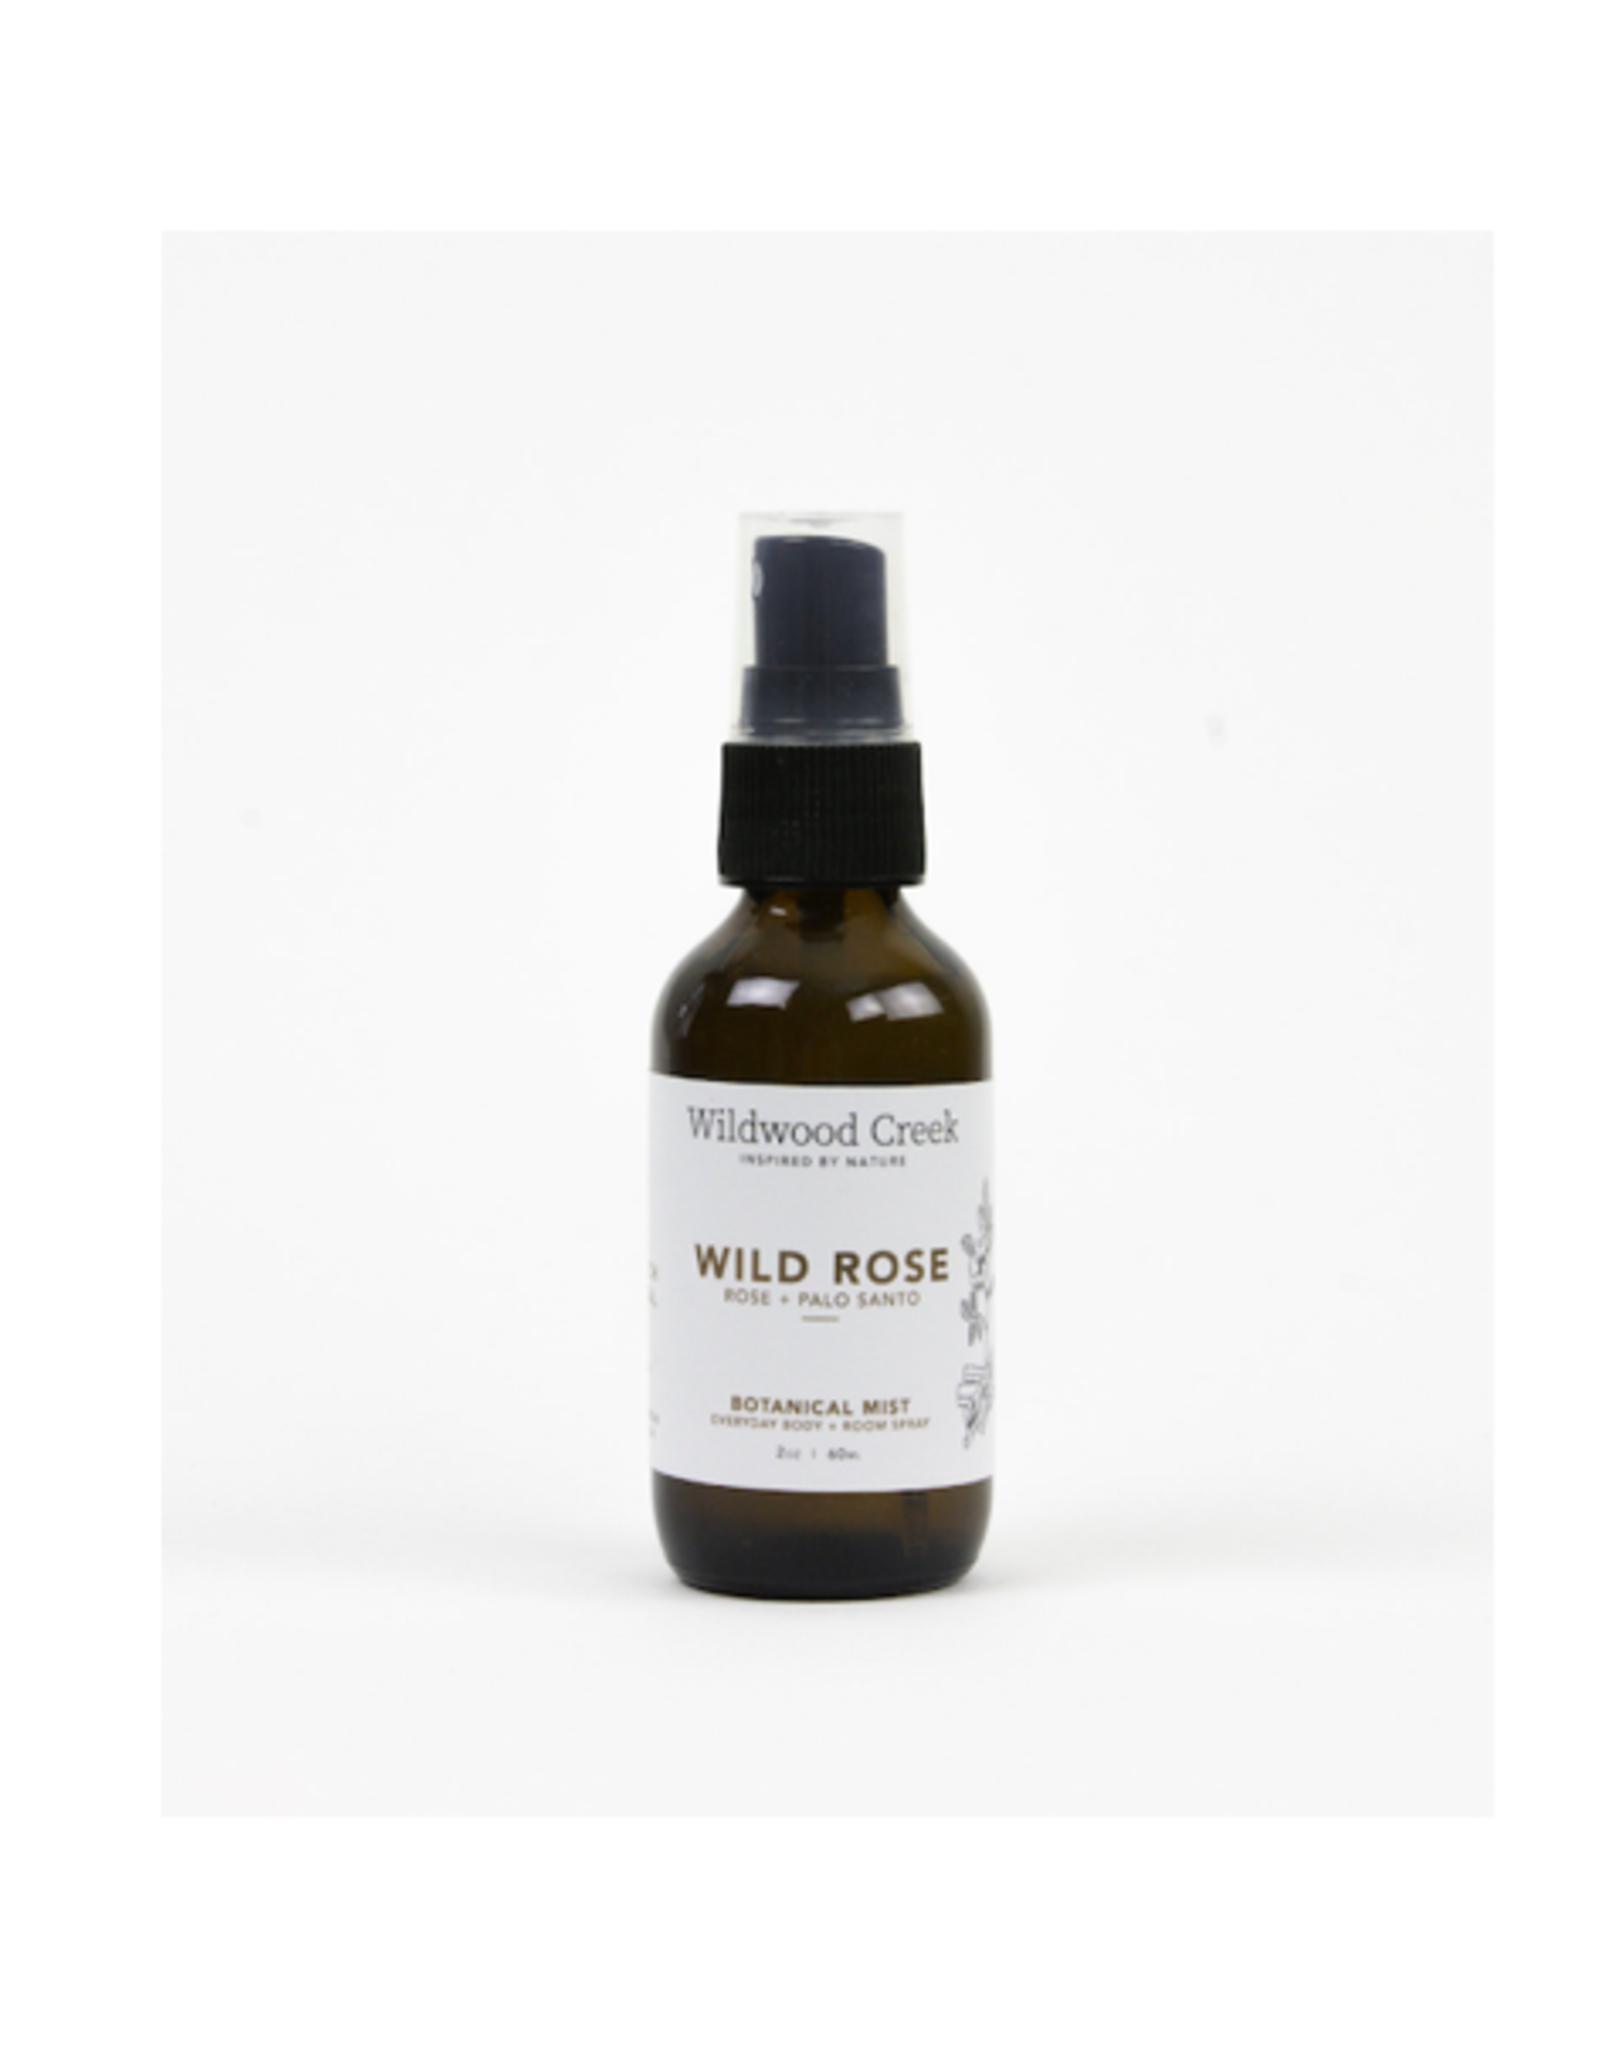 Wildwood Creek - Mist/Wild Rose 2oz